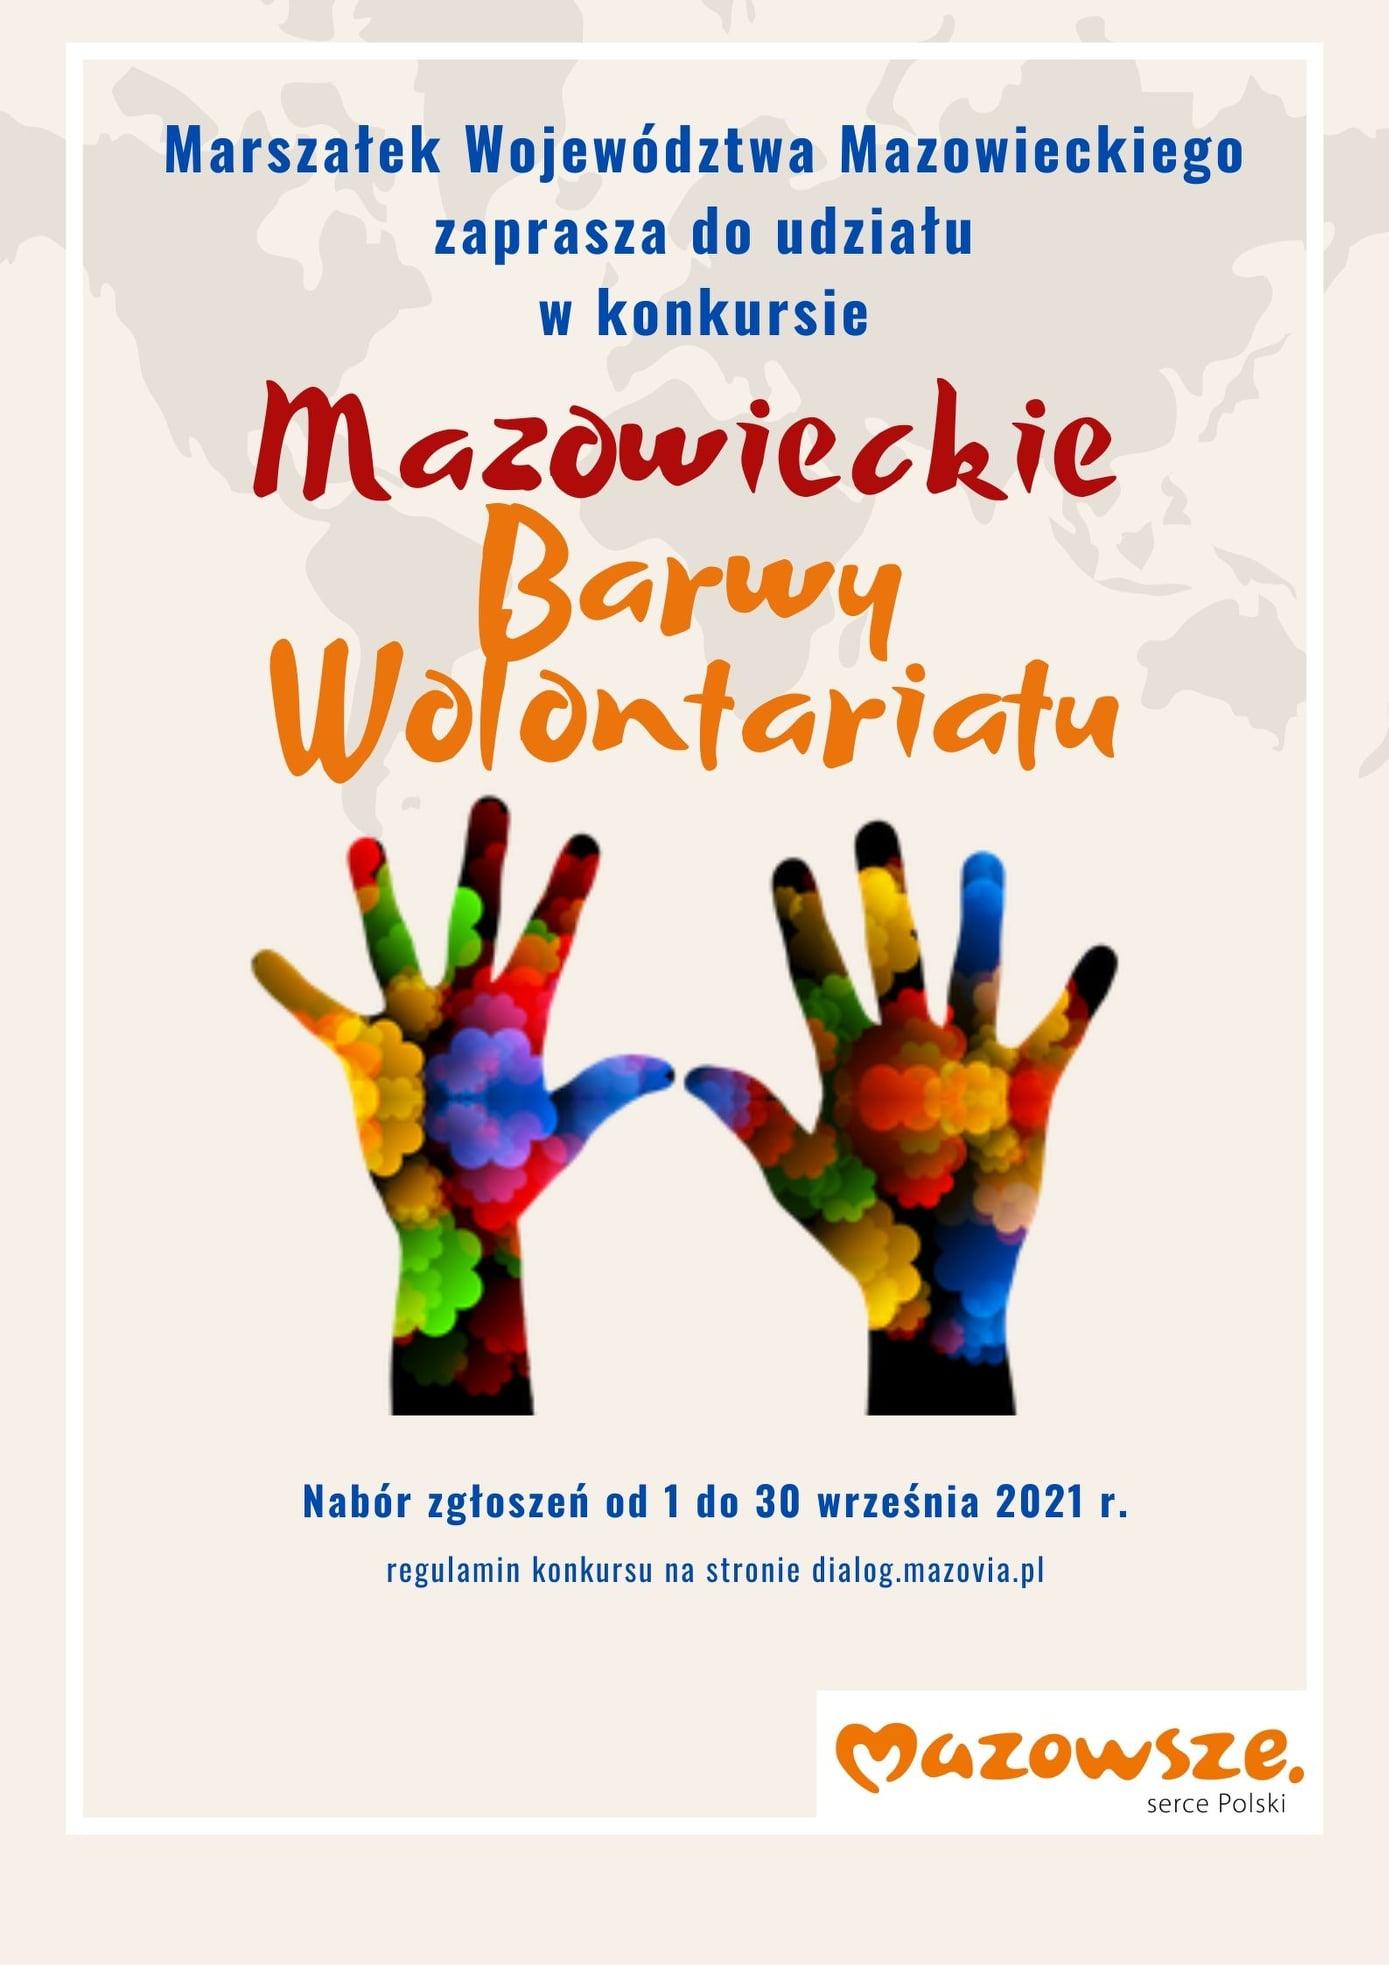 plakat nt konkursu pt Mazowieckie Barwy Wolontariatu